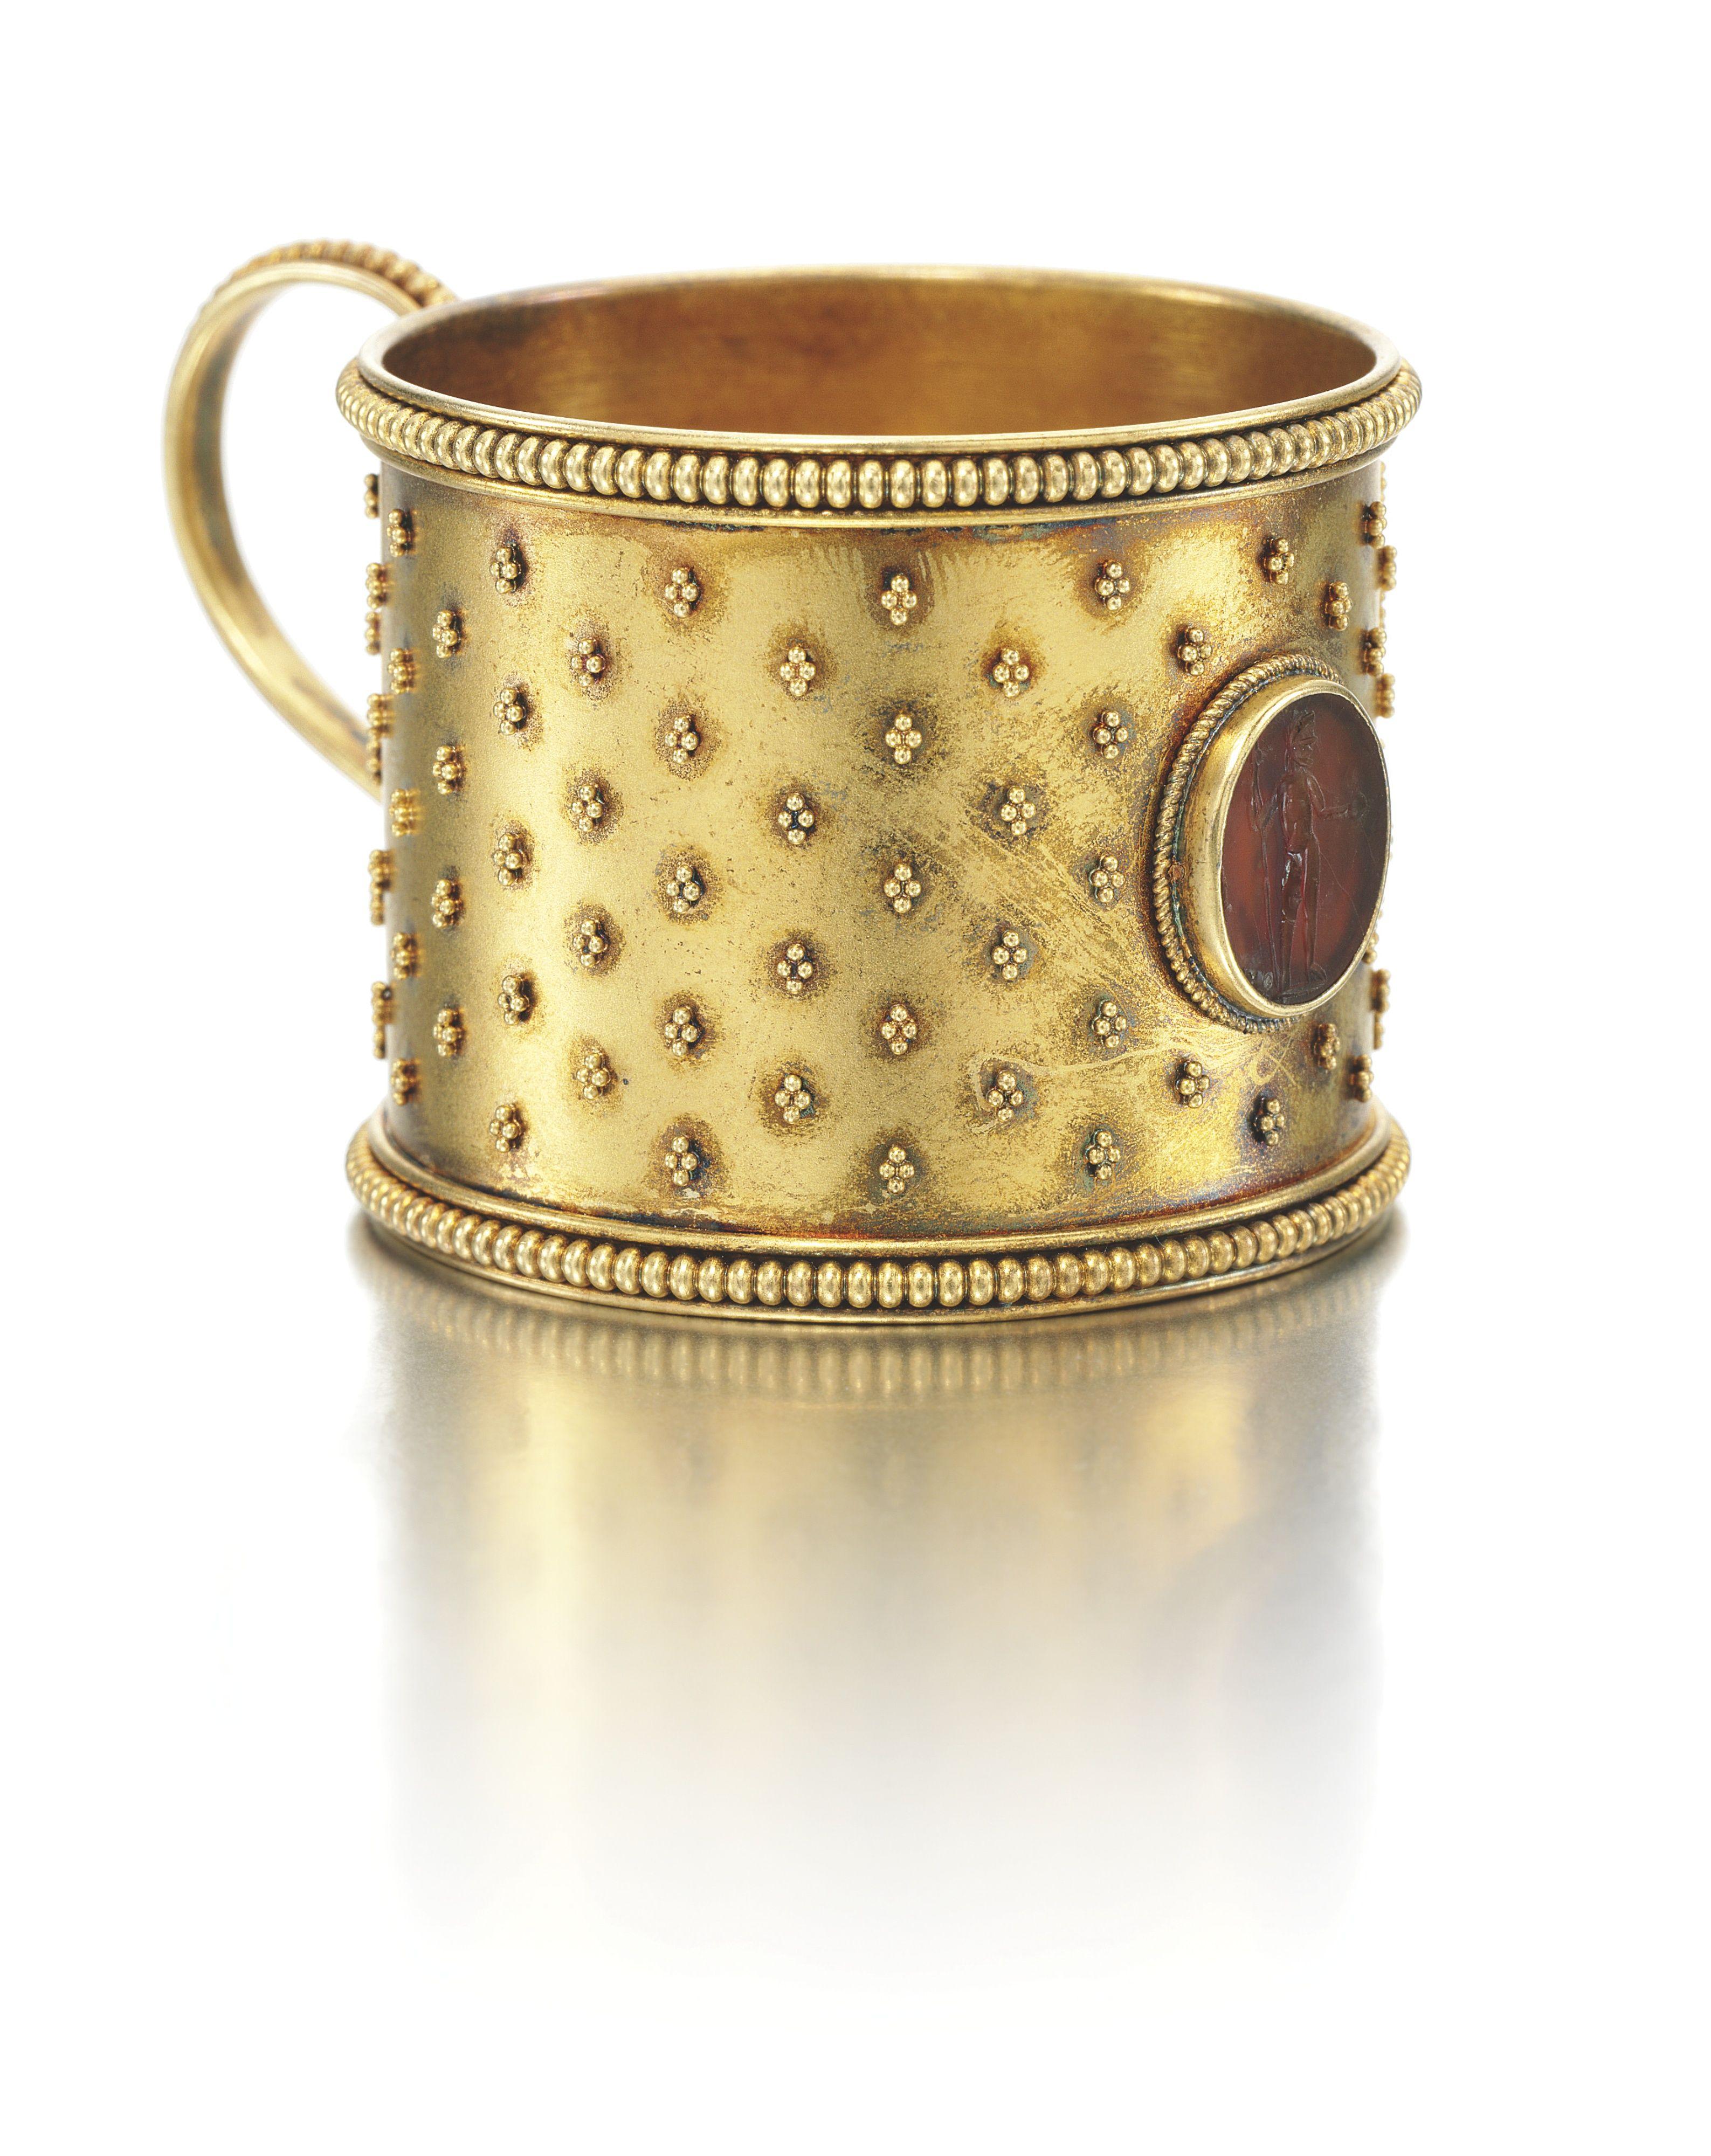 A Faberge Miniature Gold Tea Glass Holder Workmaster Erik Kollin St Petersburg Circa 1885 In Scythian Taste Cylindric Faberge Jewelry Glass Holders